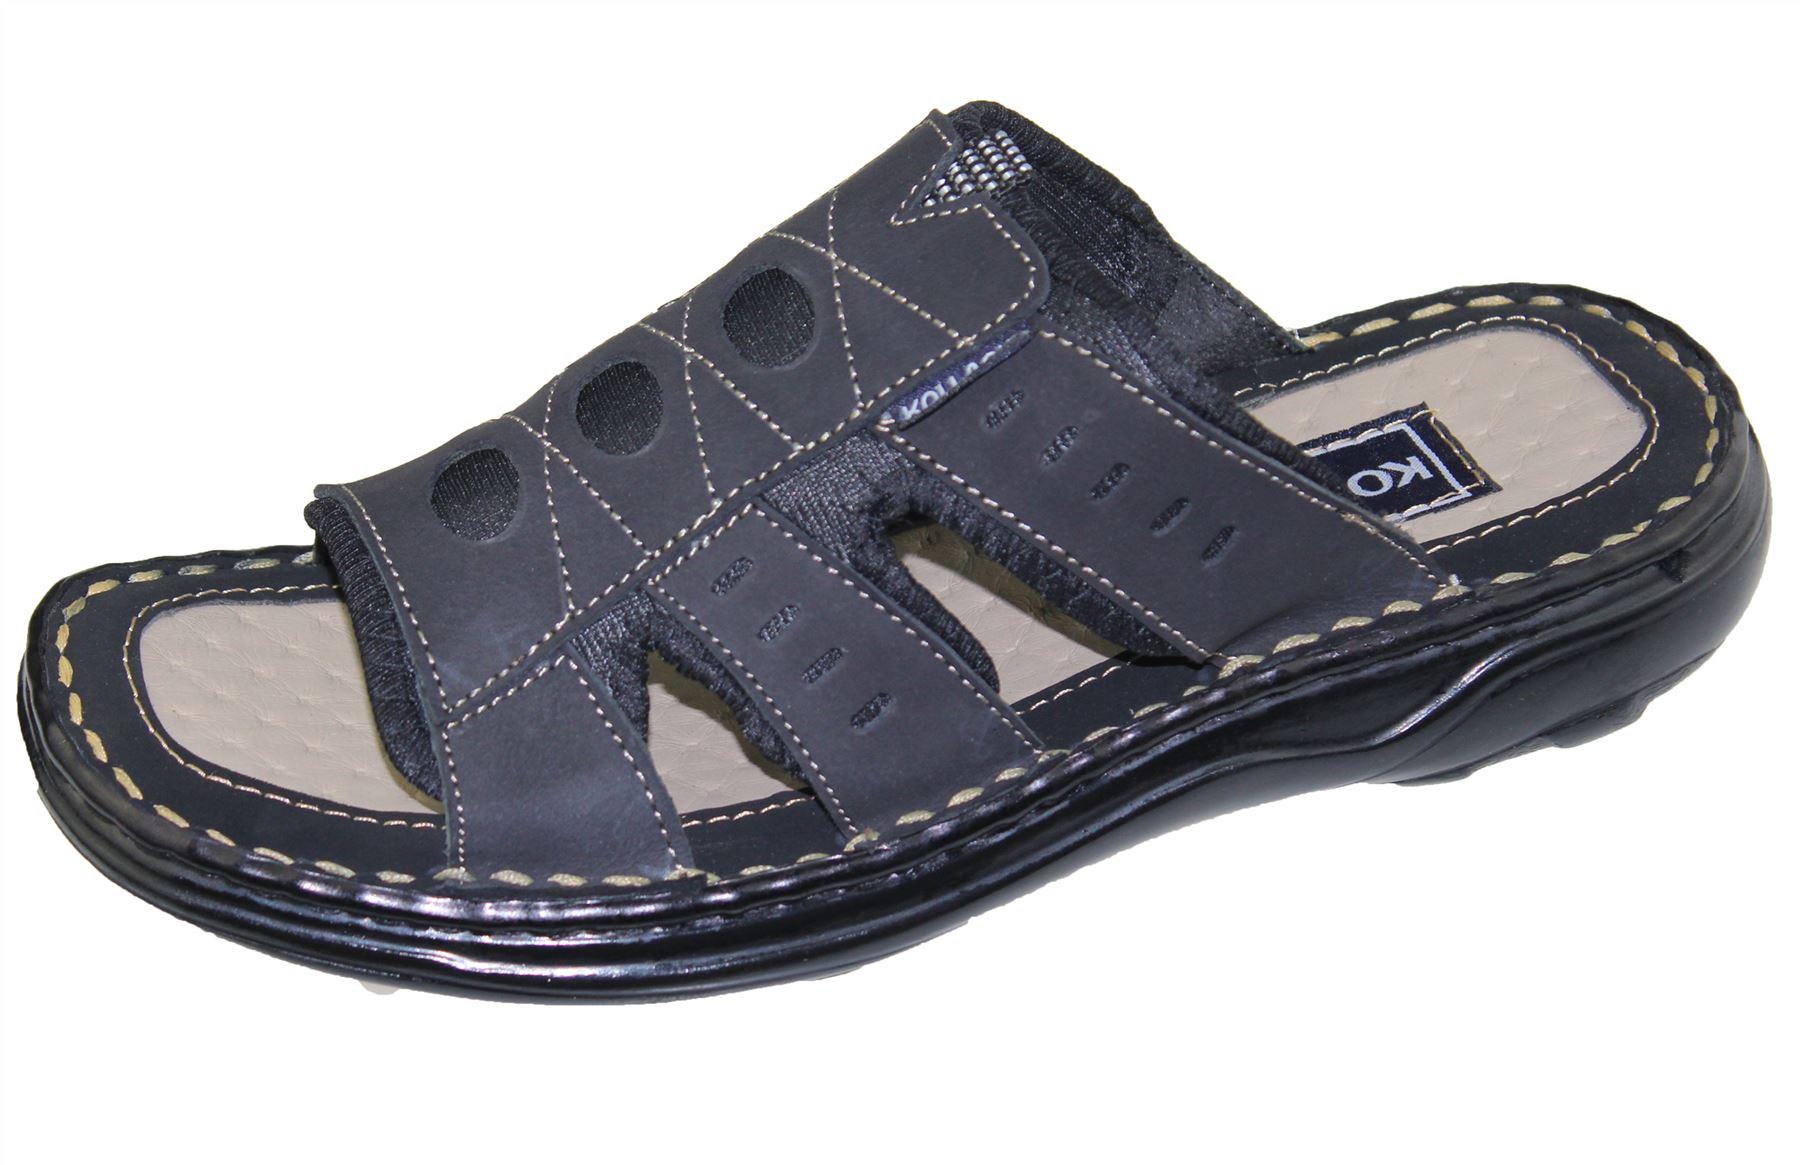 Mens-Slipper-Sandal-Sports-Beach-Buckle-Walking-Fashion-Summer-Casual-Shoes-Size miniatura 5